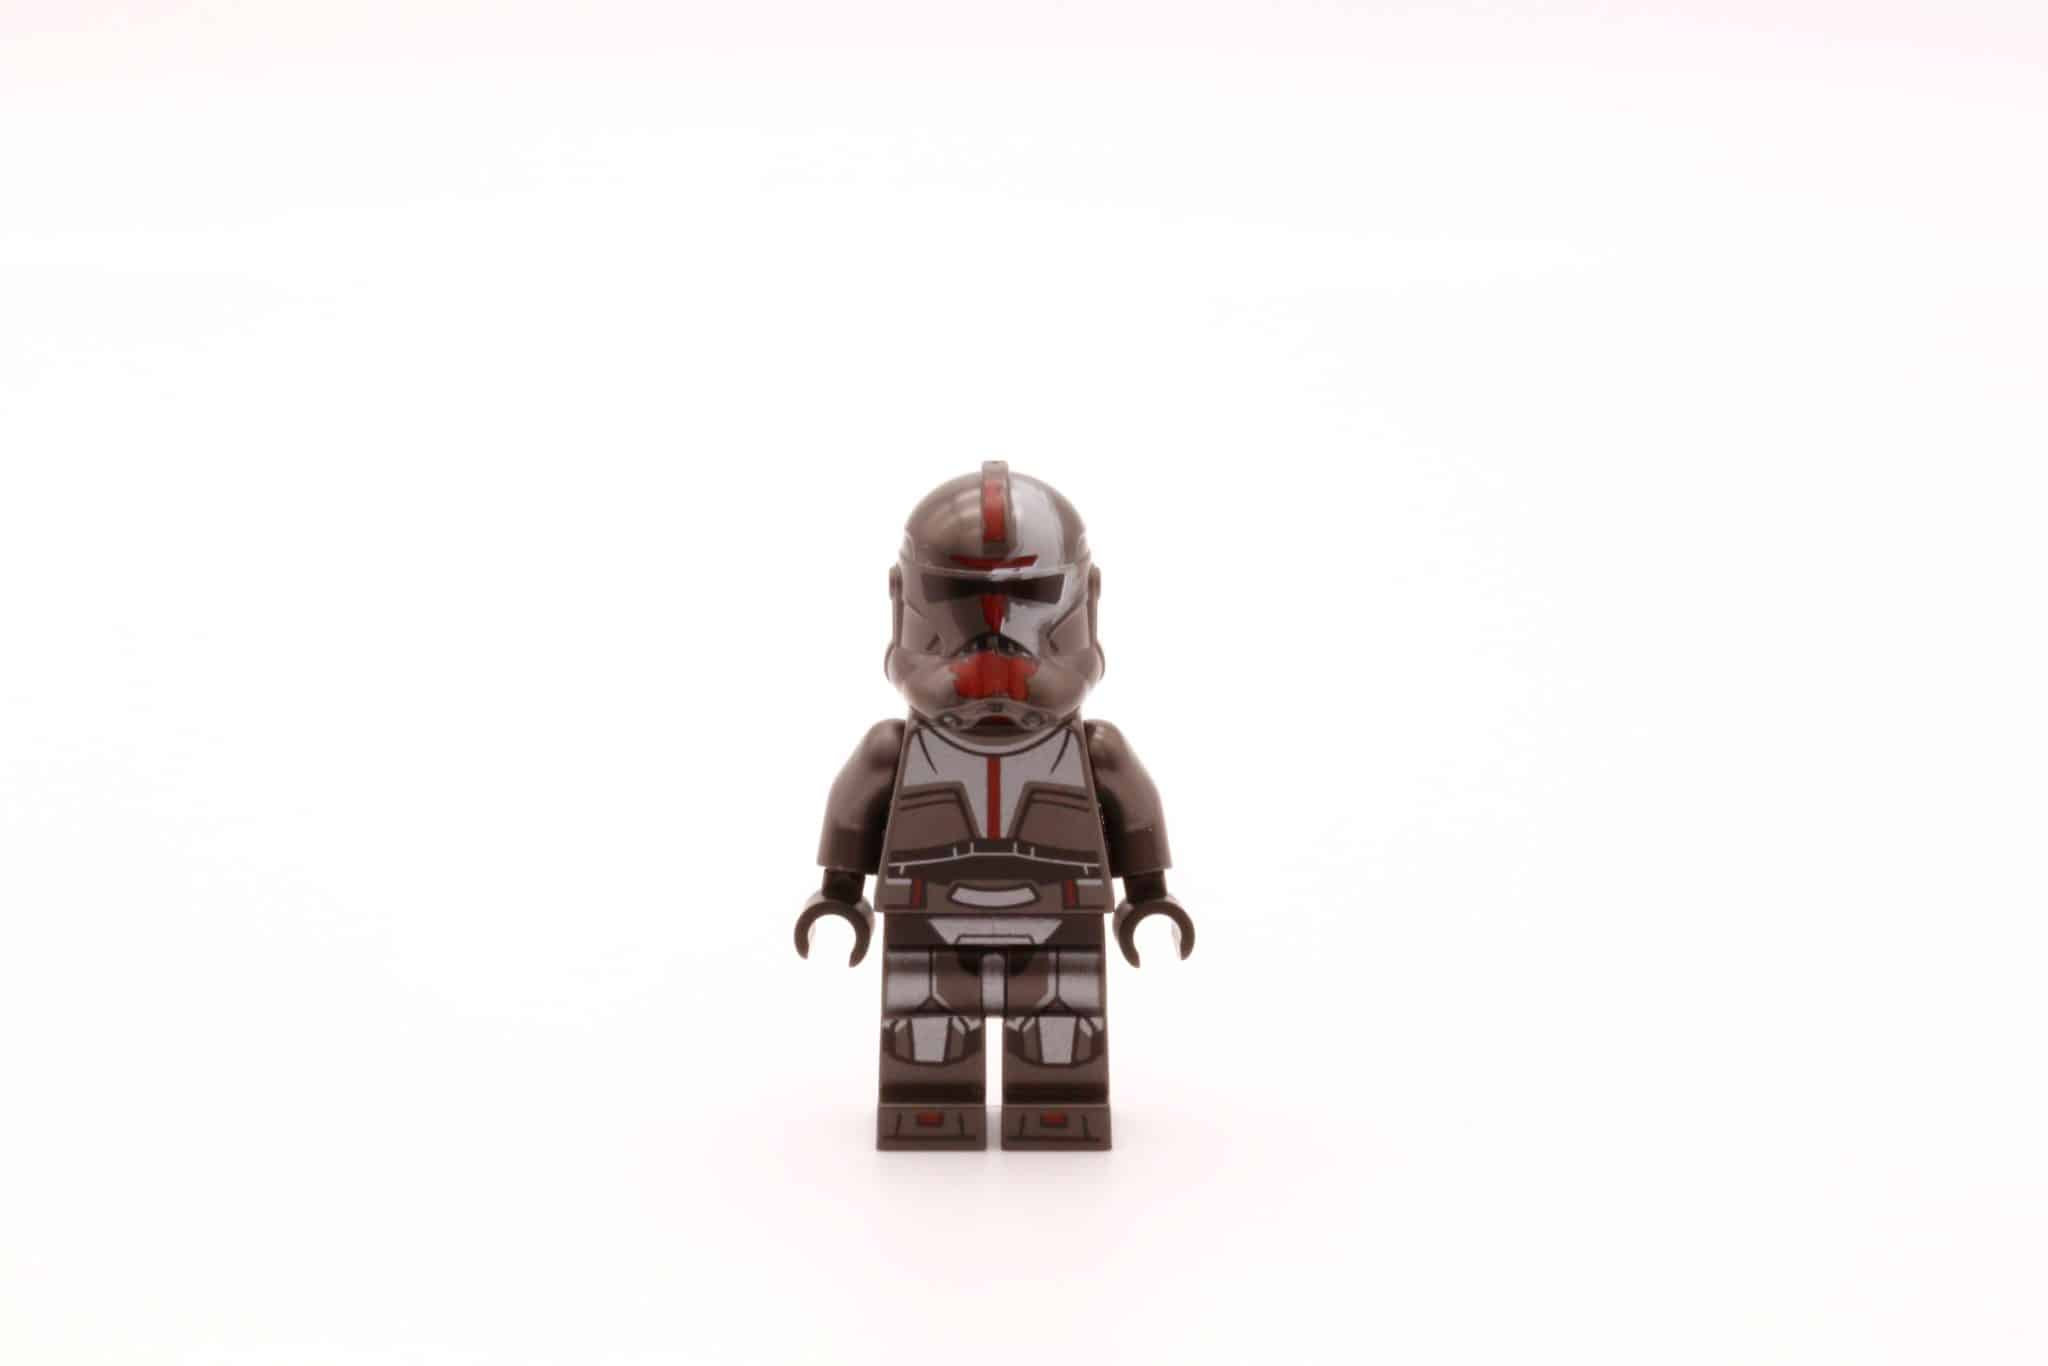 LEGO Star Wars 75314 The Bad Batch Attack Shuttle Hunter Helm